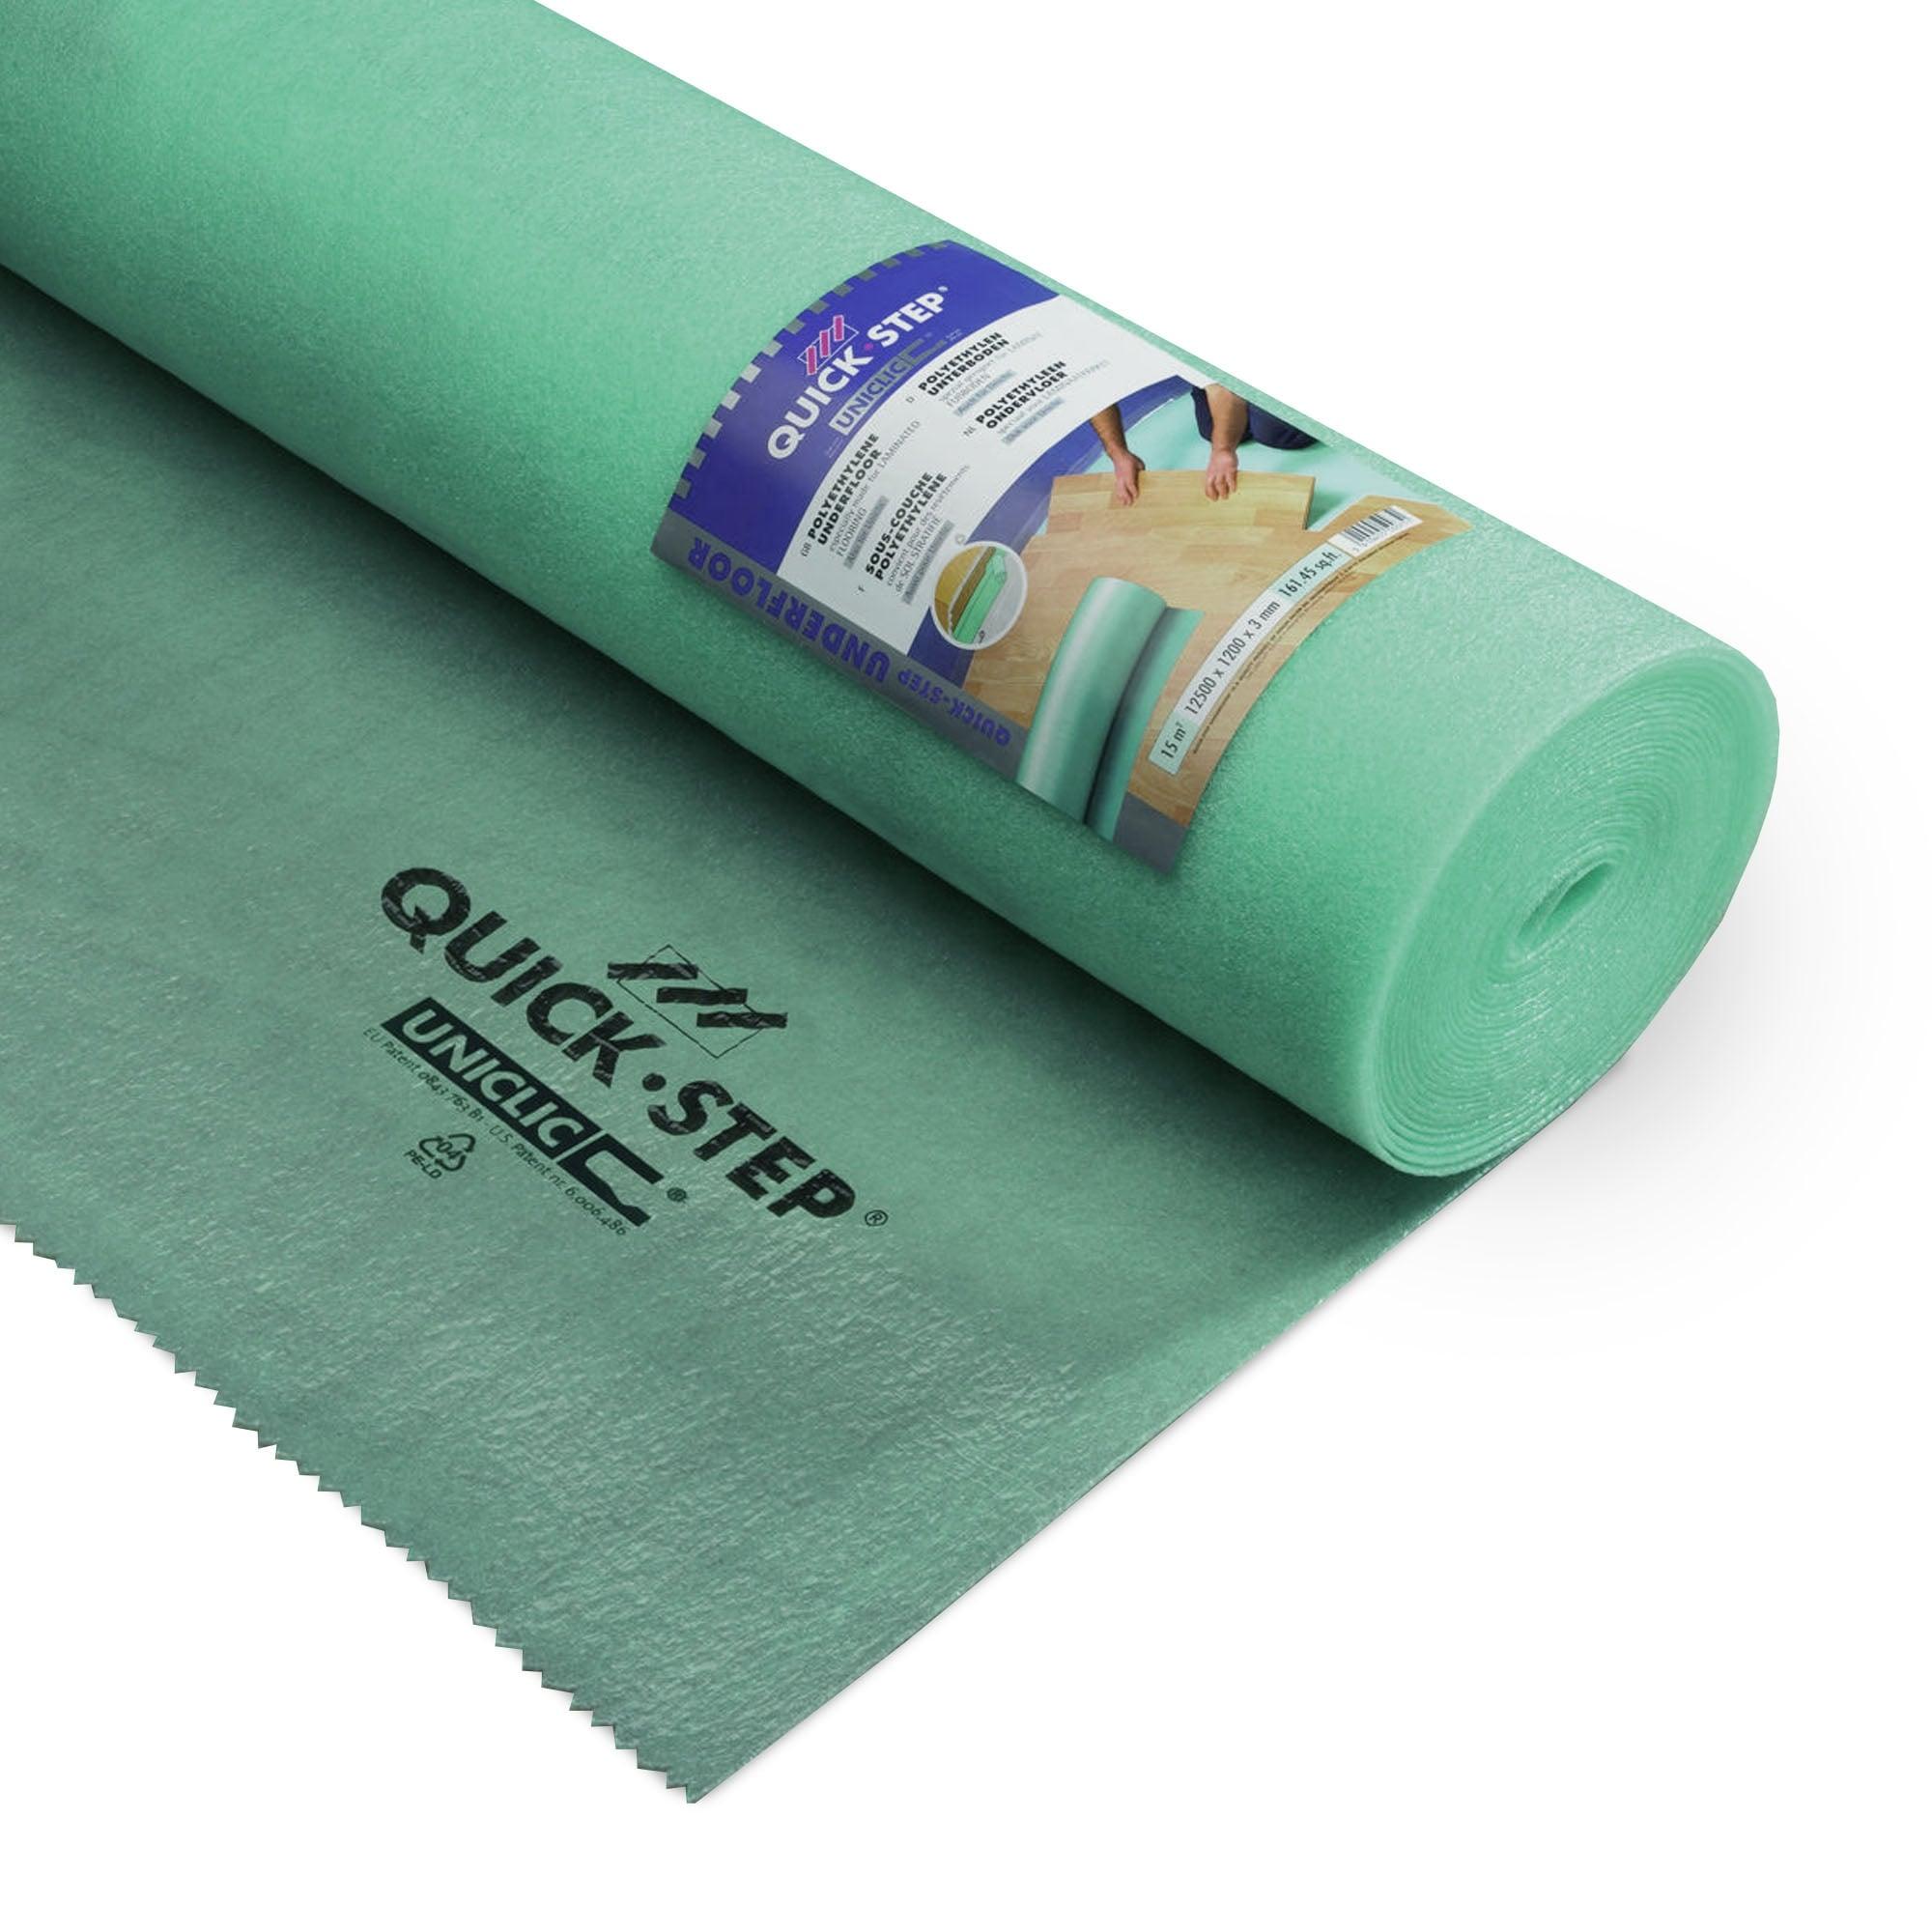 Quickstep uniclic basic 3mm foam flooring underlay for Uniclic laminate flooring